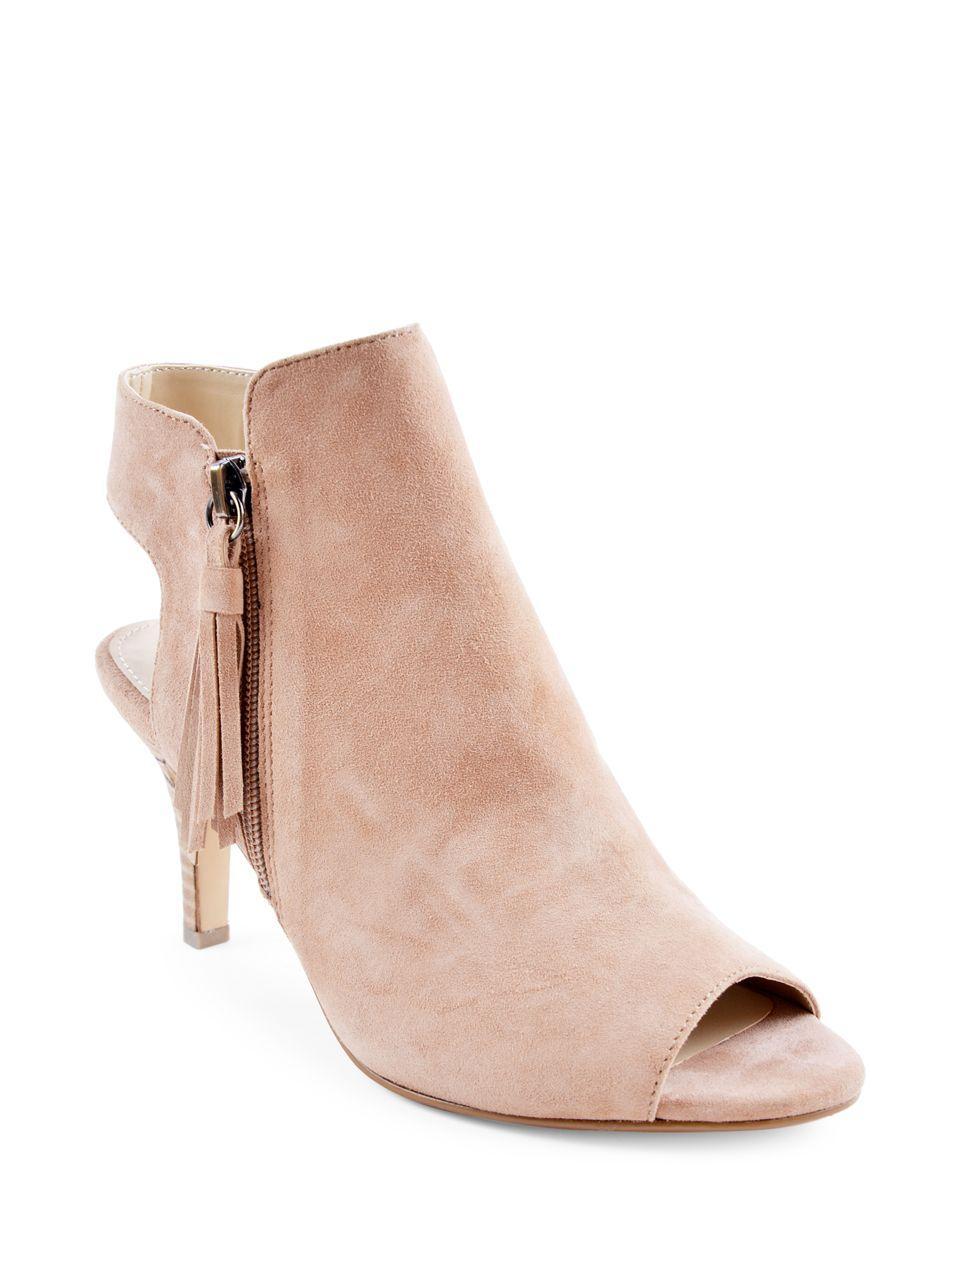 Adrienne Vittadini Dress Shoes